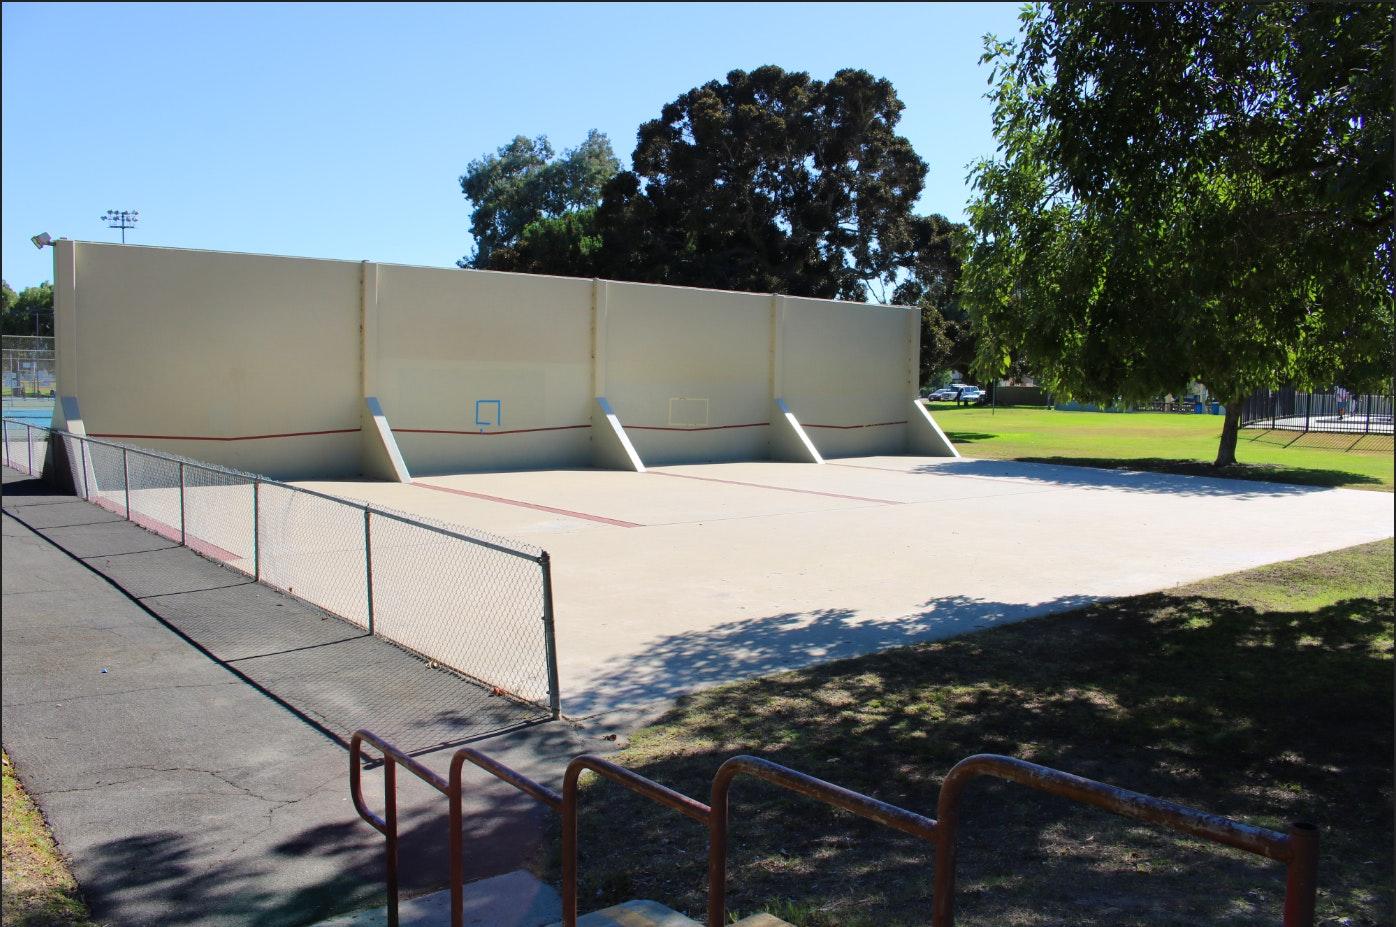 Bob Kildee Community Park